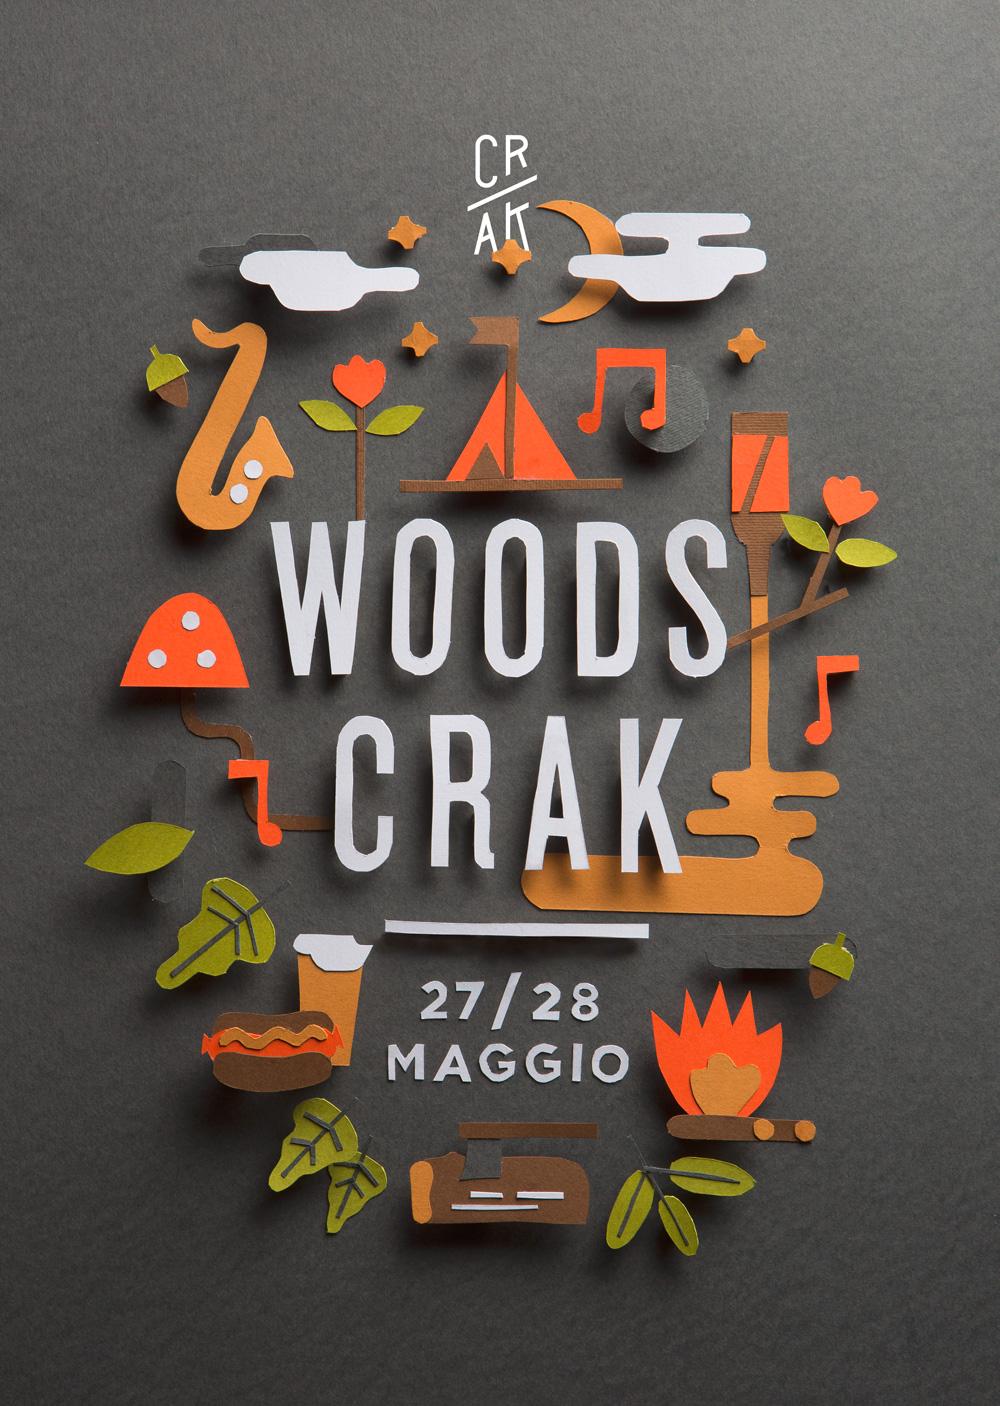 poster woodscrack beer festival